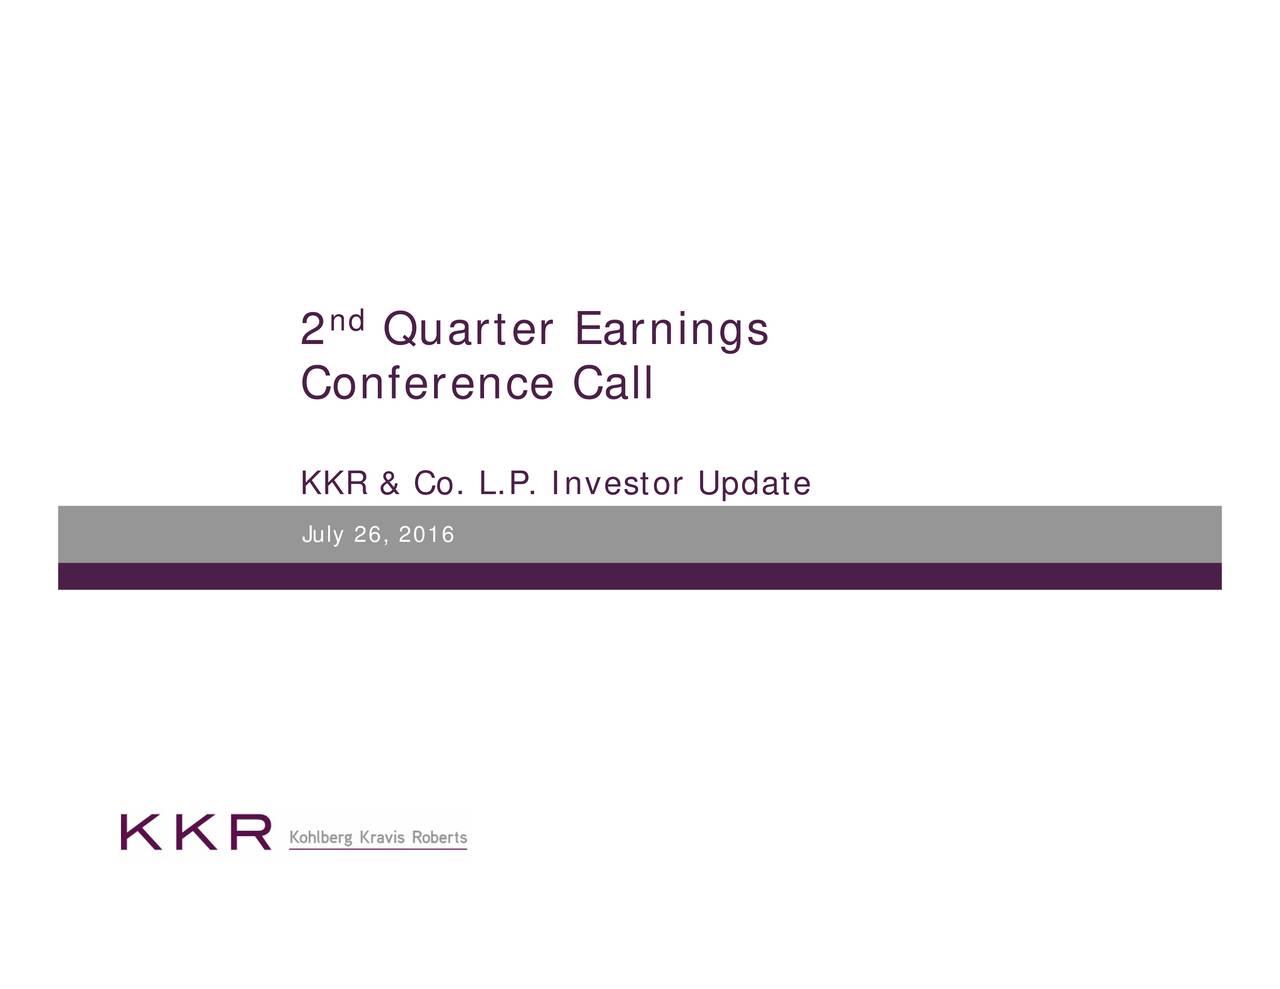 nd 2 ConfeKKR & Co. L.P. Investor Update